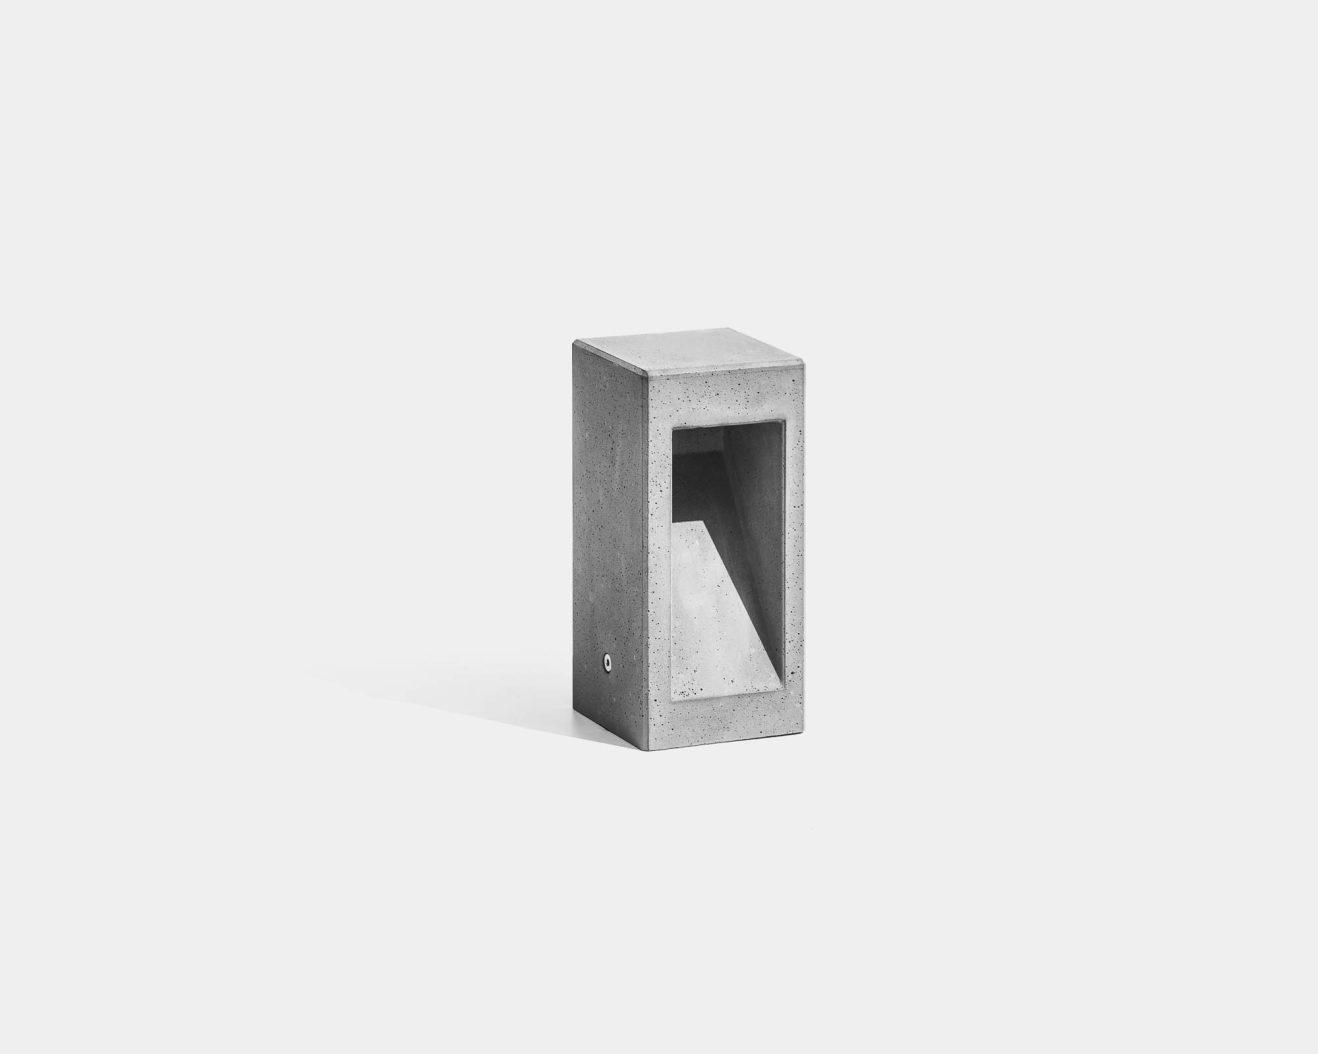 Cube-BentuDesign-Floorlamp3